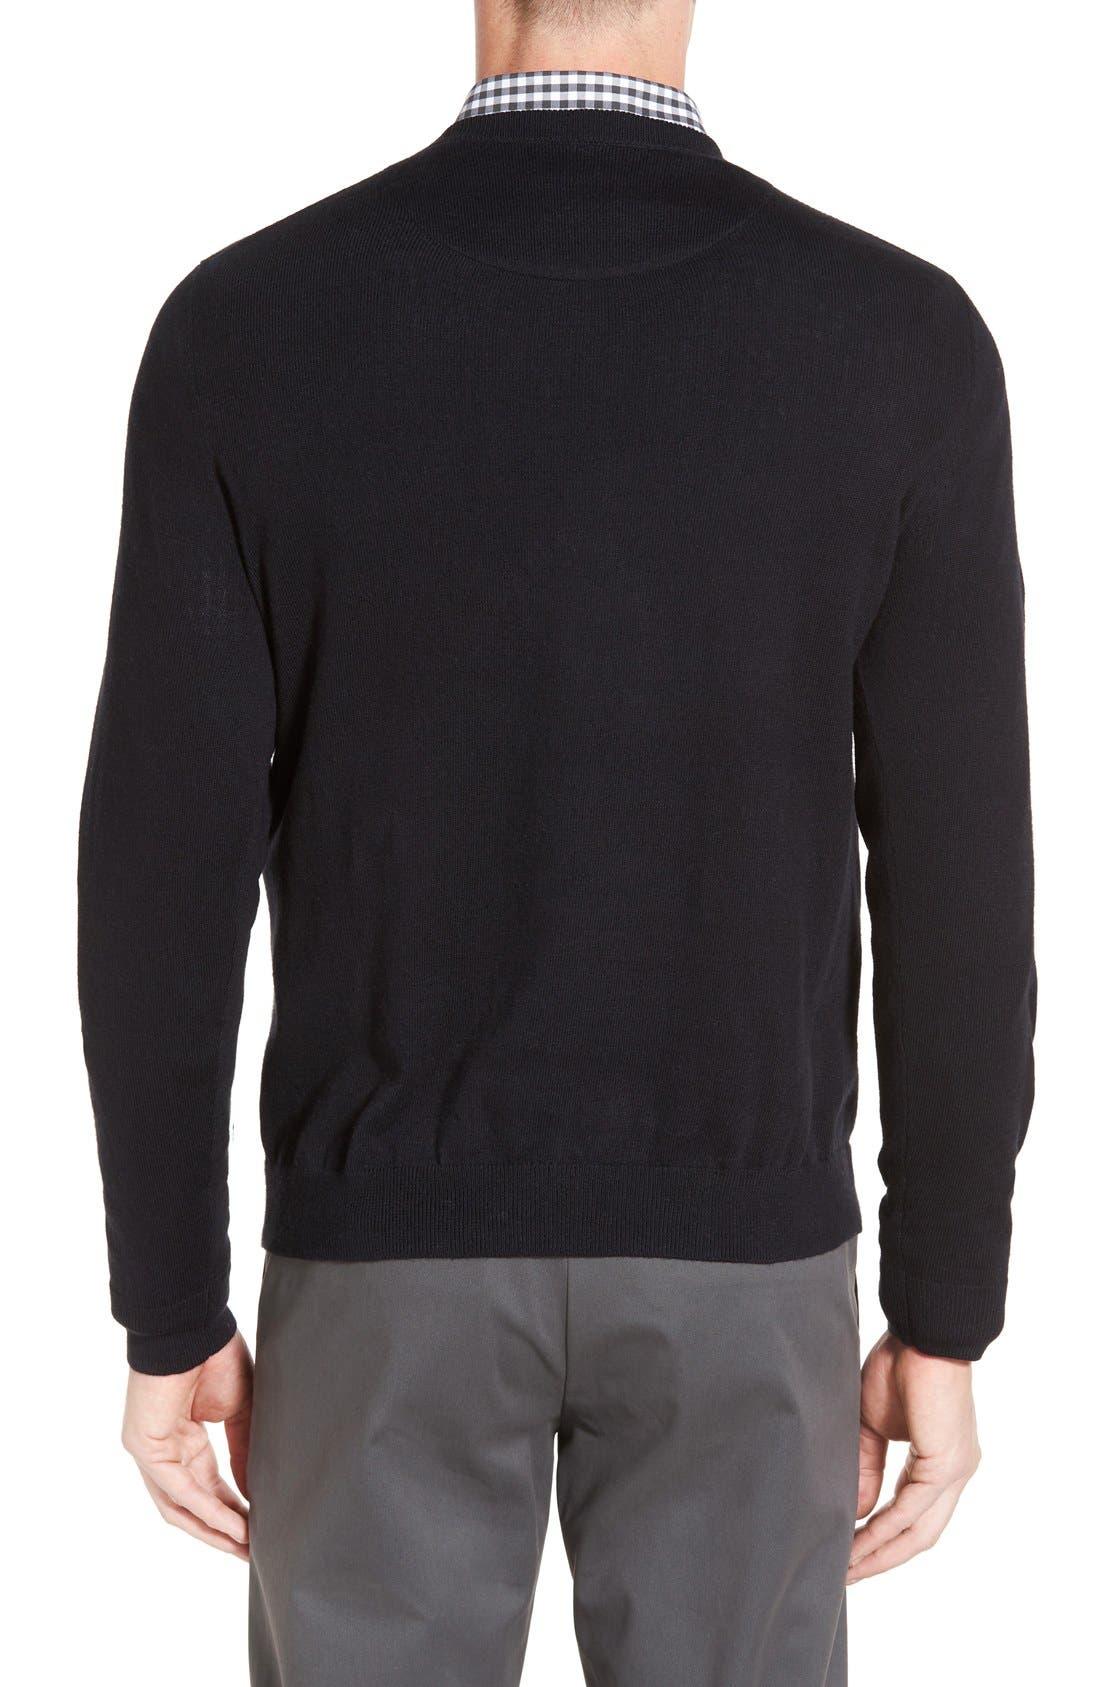 Cotton & Cashmere Crewneck Sweater,                             Alternate thumbnail 2, color,                             Black Caviar